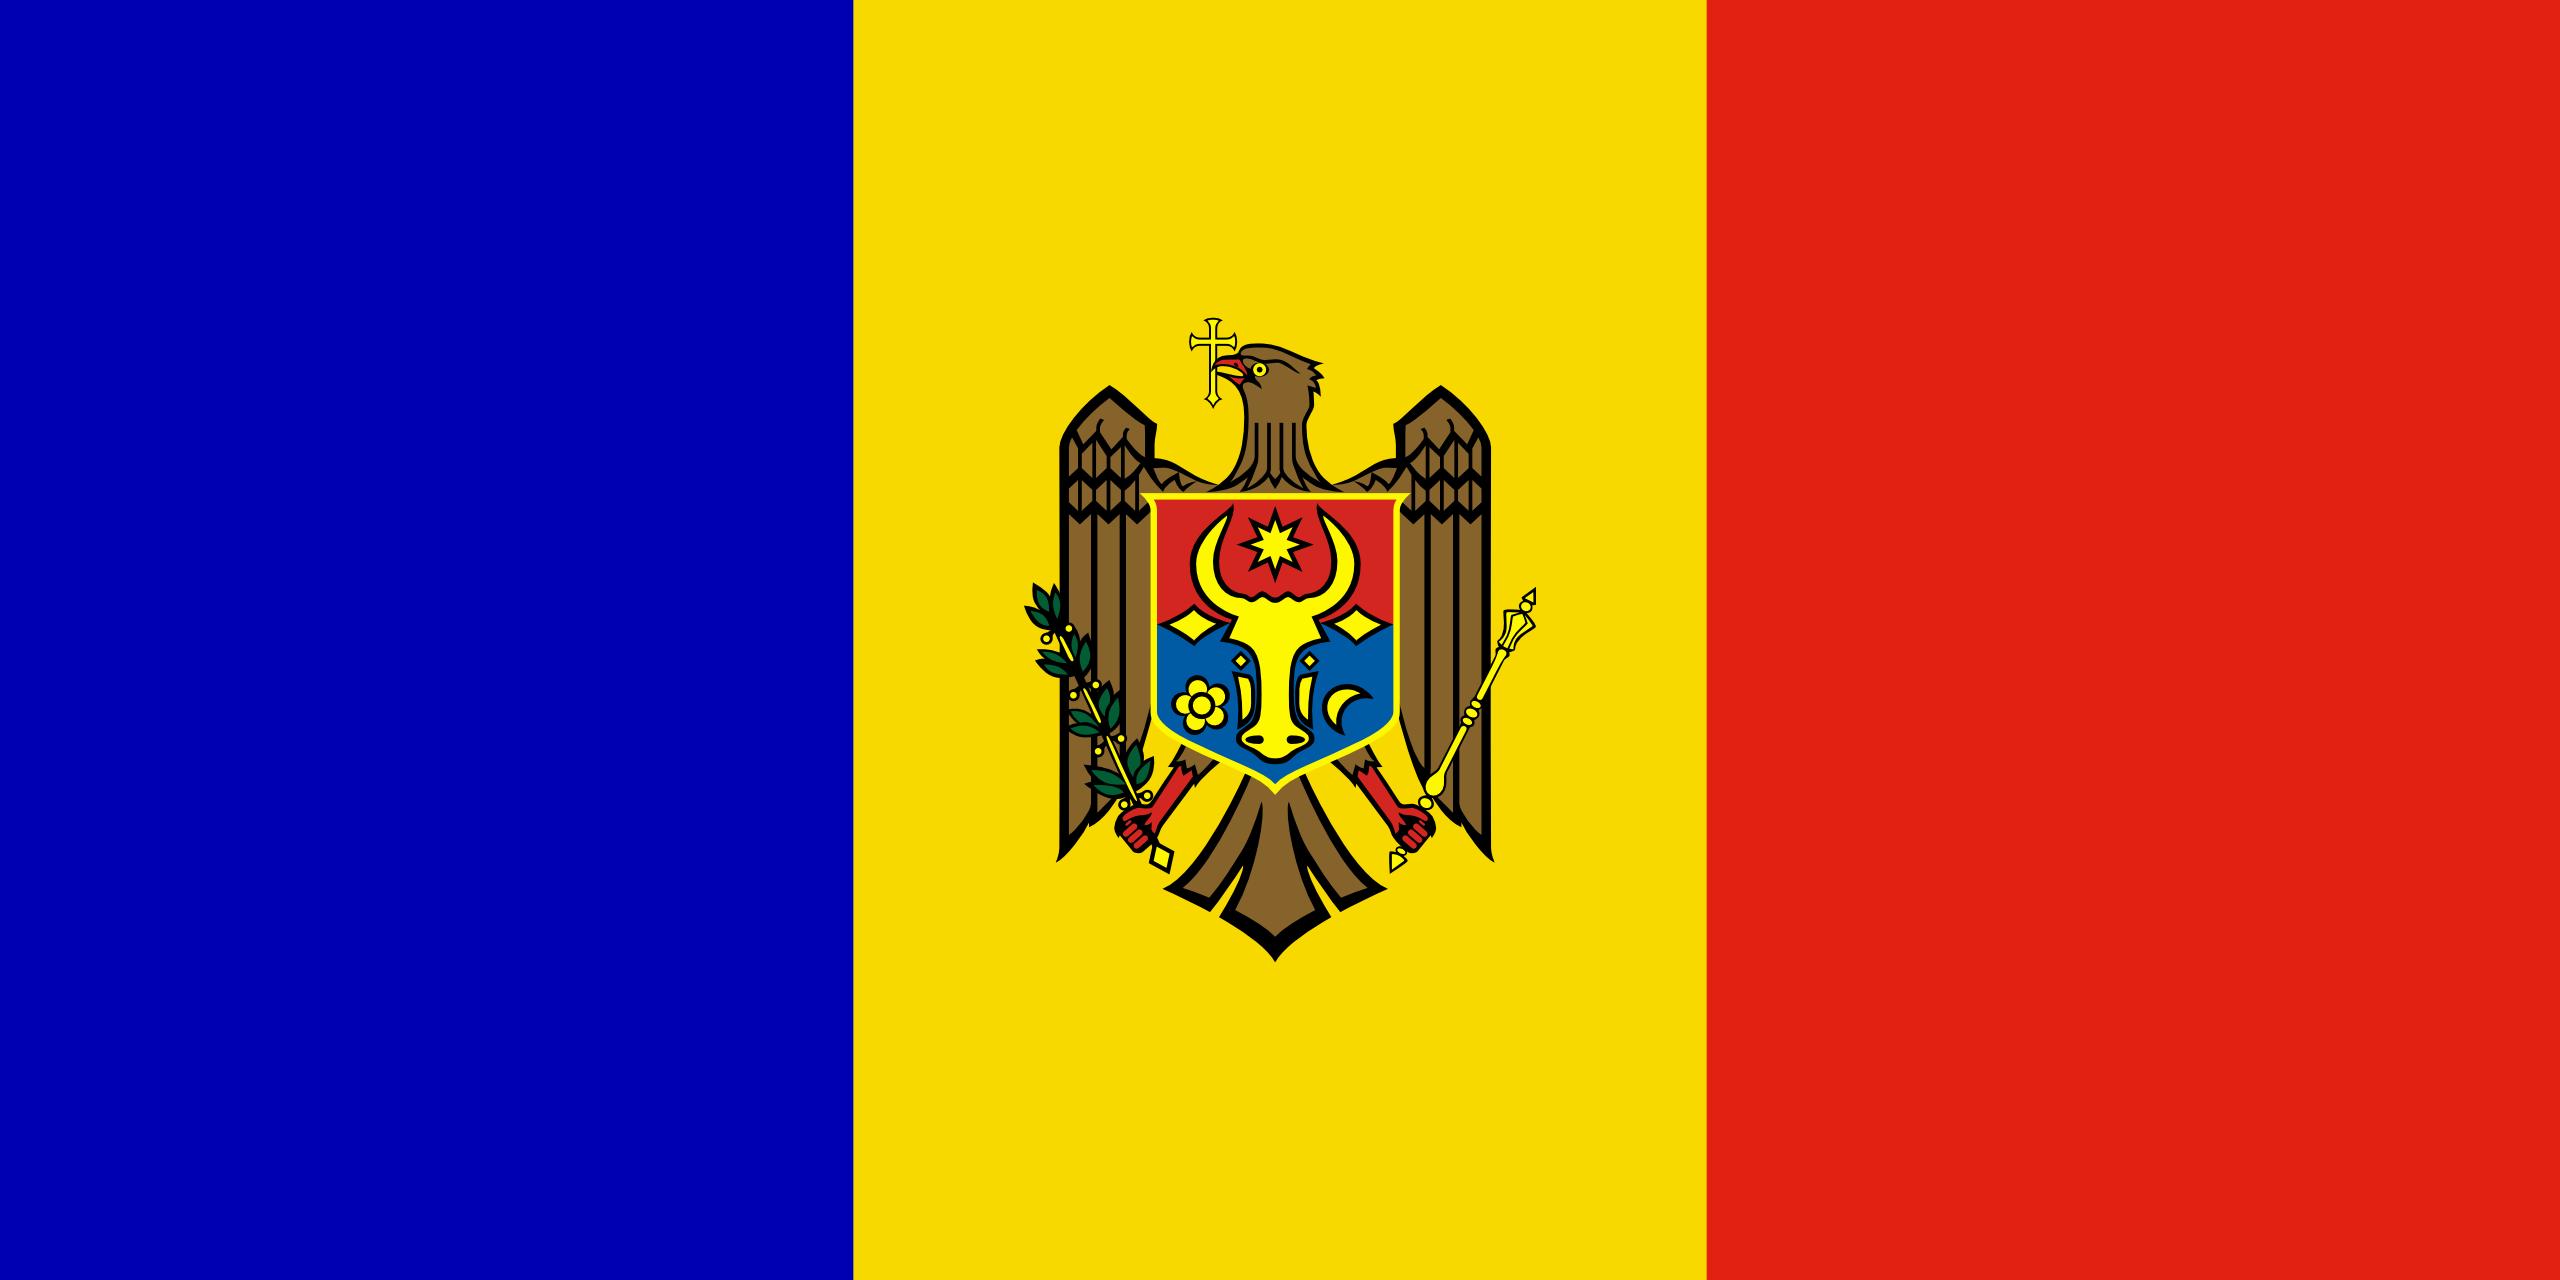 moldavia, país, emblema, insignia, símbolo - Fondos de Pantalla HD - professor-falken.com